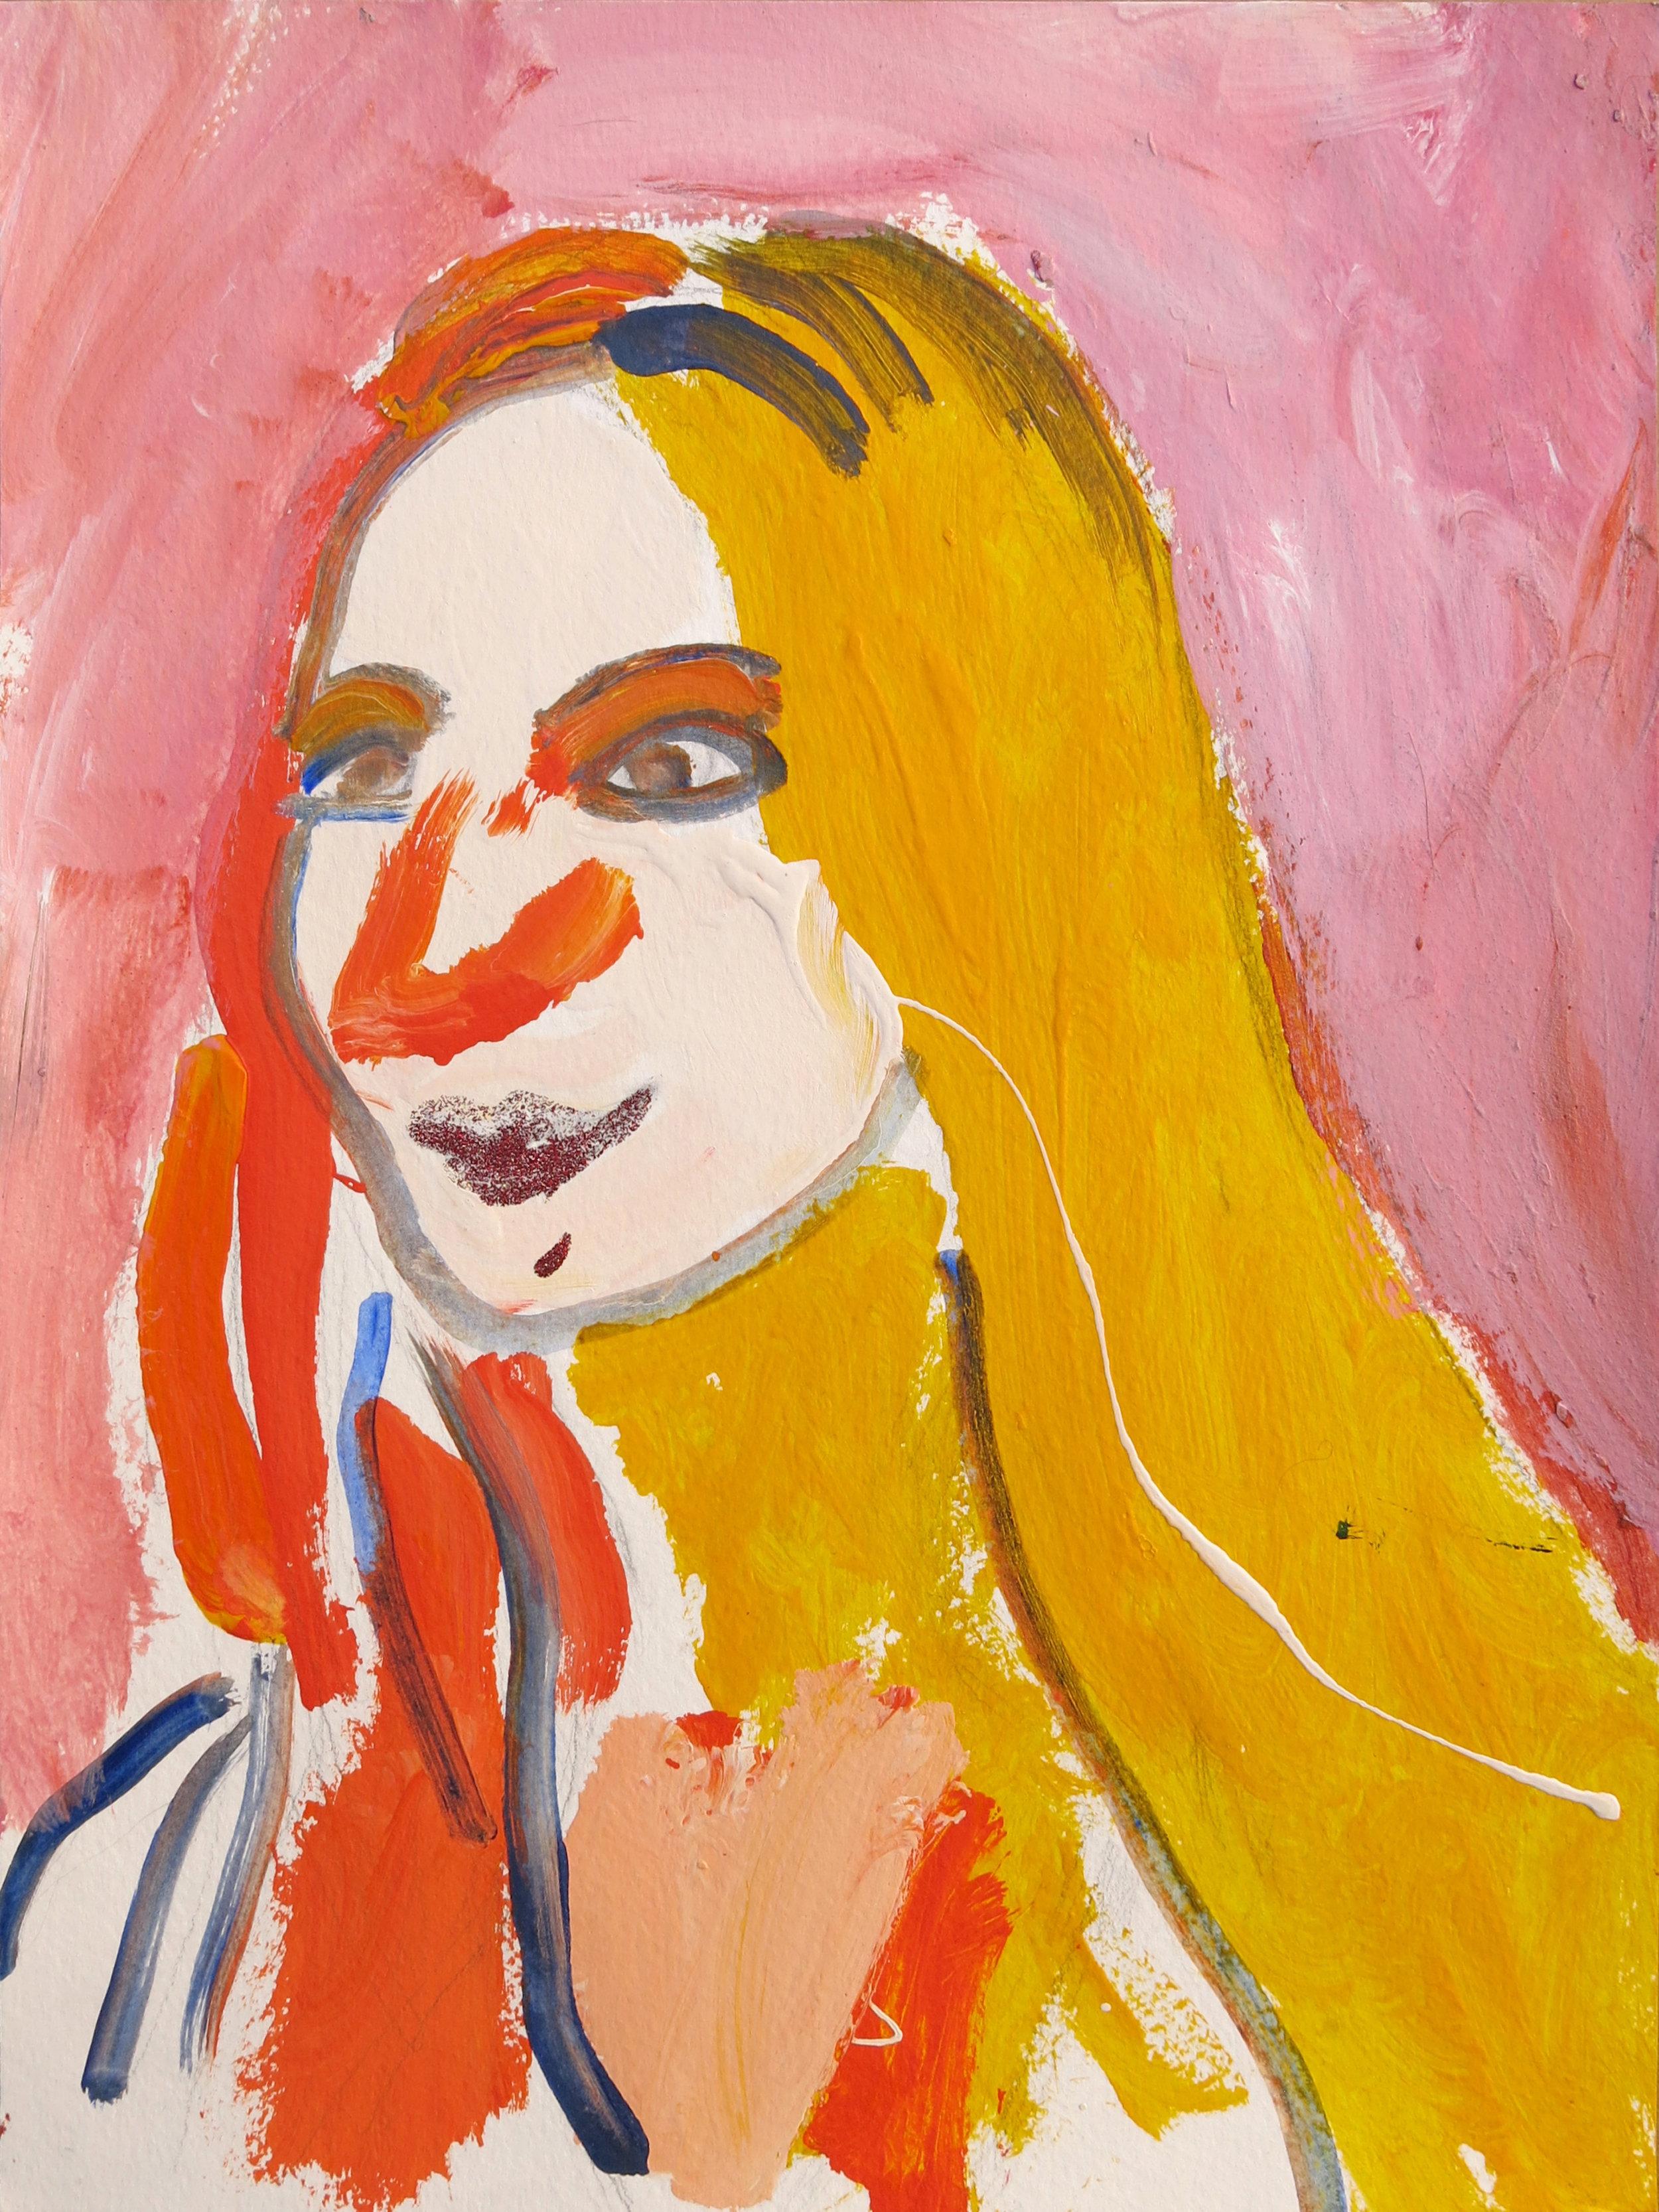 Barbra Streisand Portrait #19